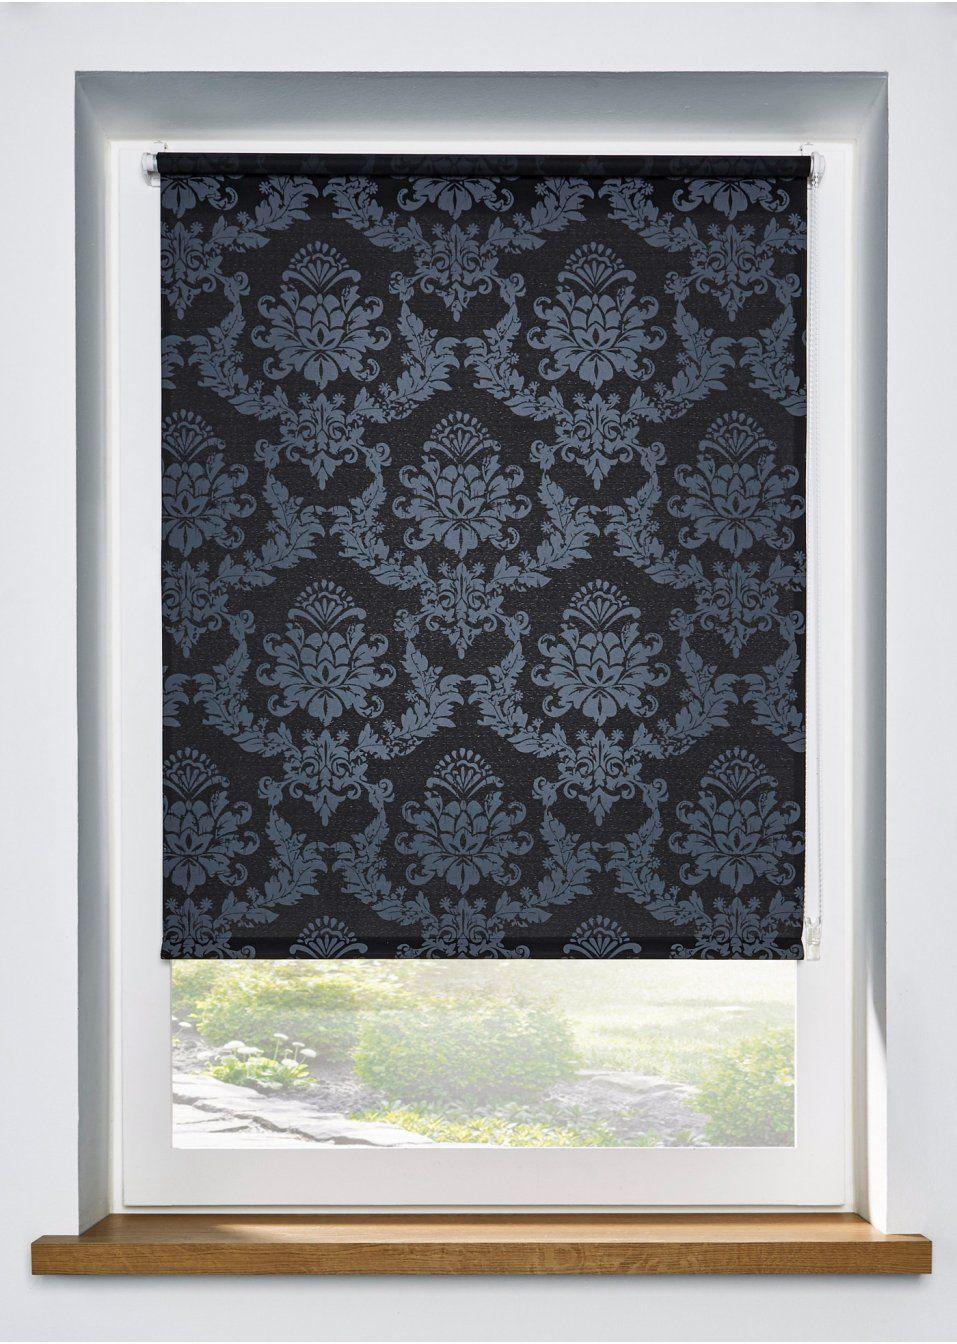 Rollo Mit Elegantem Ornament Druck Schwarz Grau Klemmtrager Elegantem Klemmtrager Mit Ornamentdruck Rollo Sc In 2020 Roman Shade Curtain Home Decor Curtains